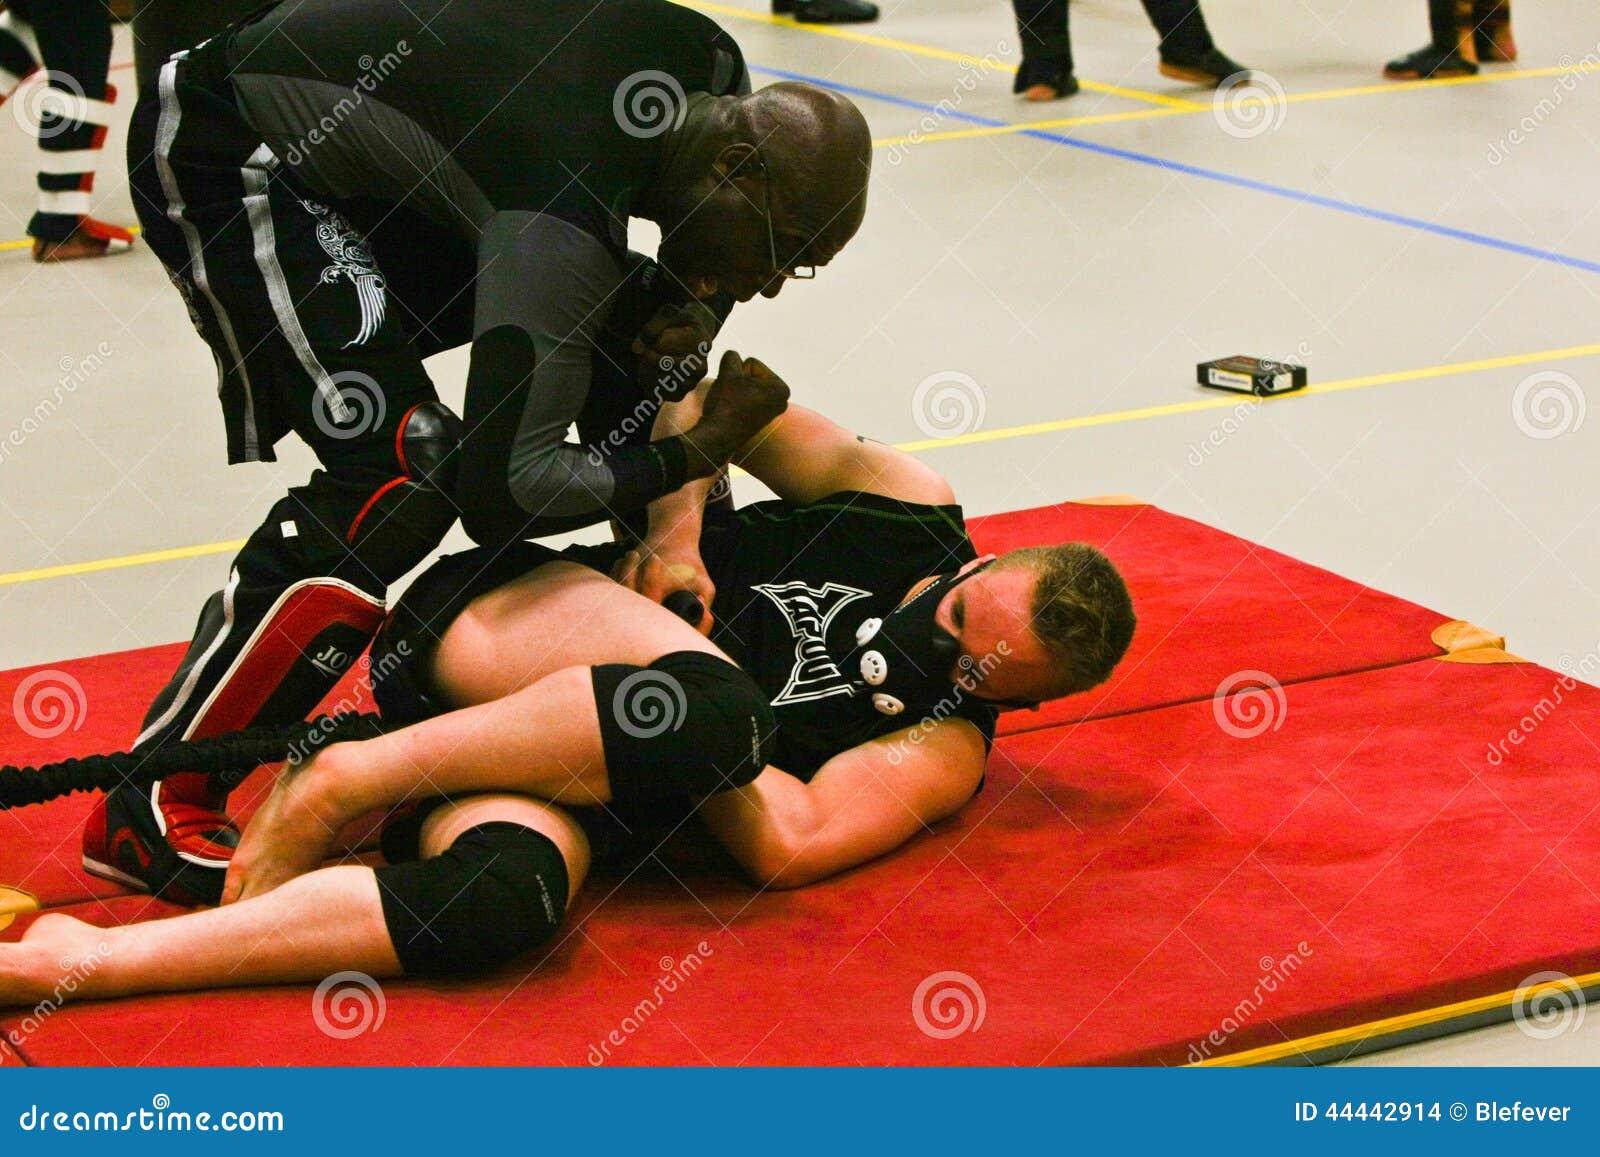 Judoka training with HPVT mask